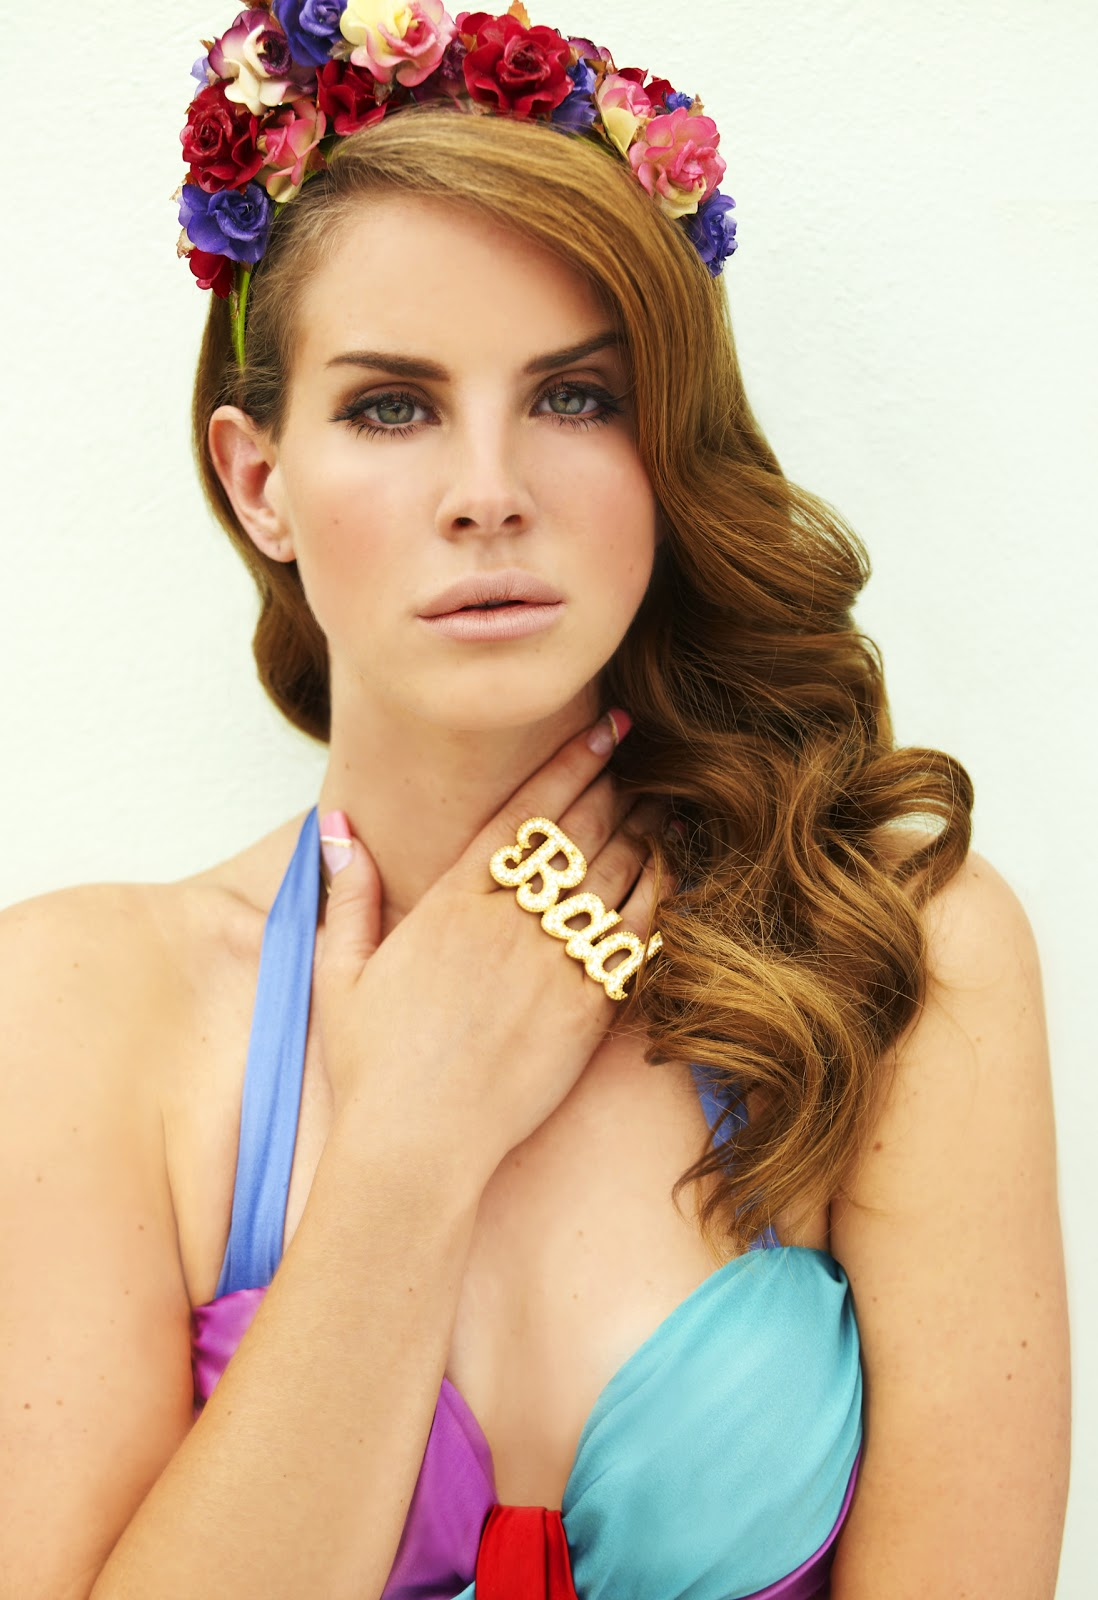 Lana Del Rey By Chris Nicholls For Fashion Magazine: GlossLip : Most Beautiful Celebrities, Actresses, Girls